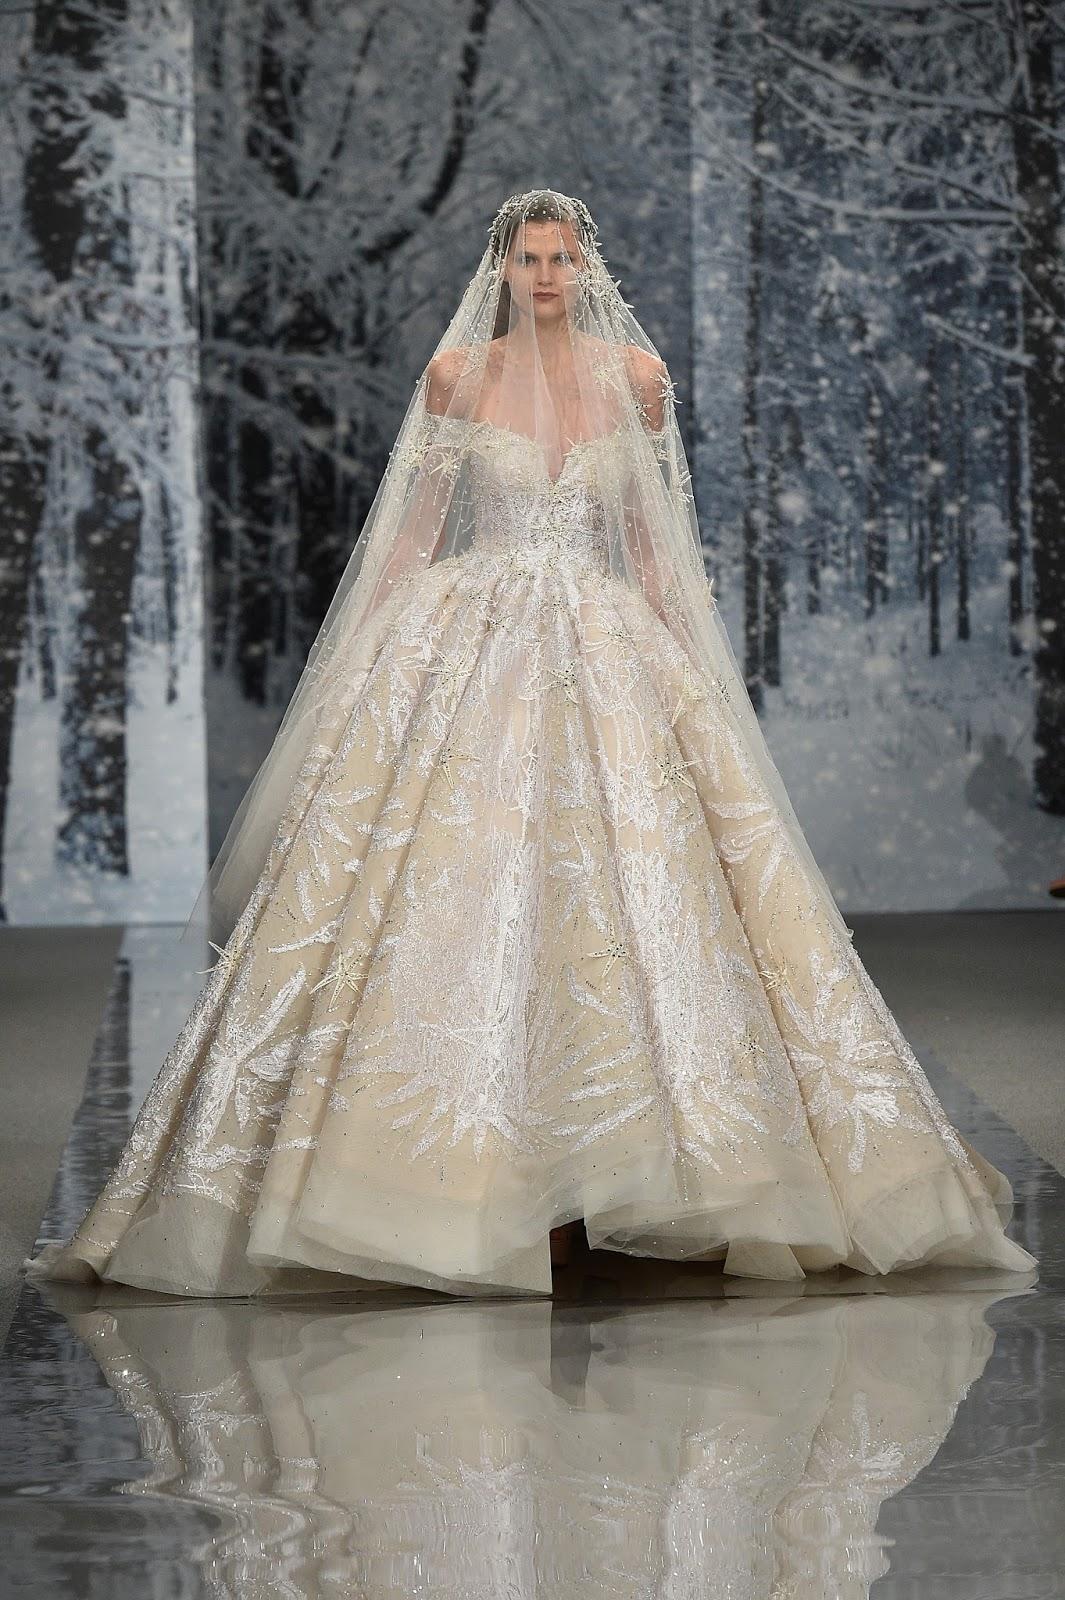 Défilé Ziad Nakad couture automne-hiver 17-18